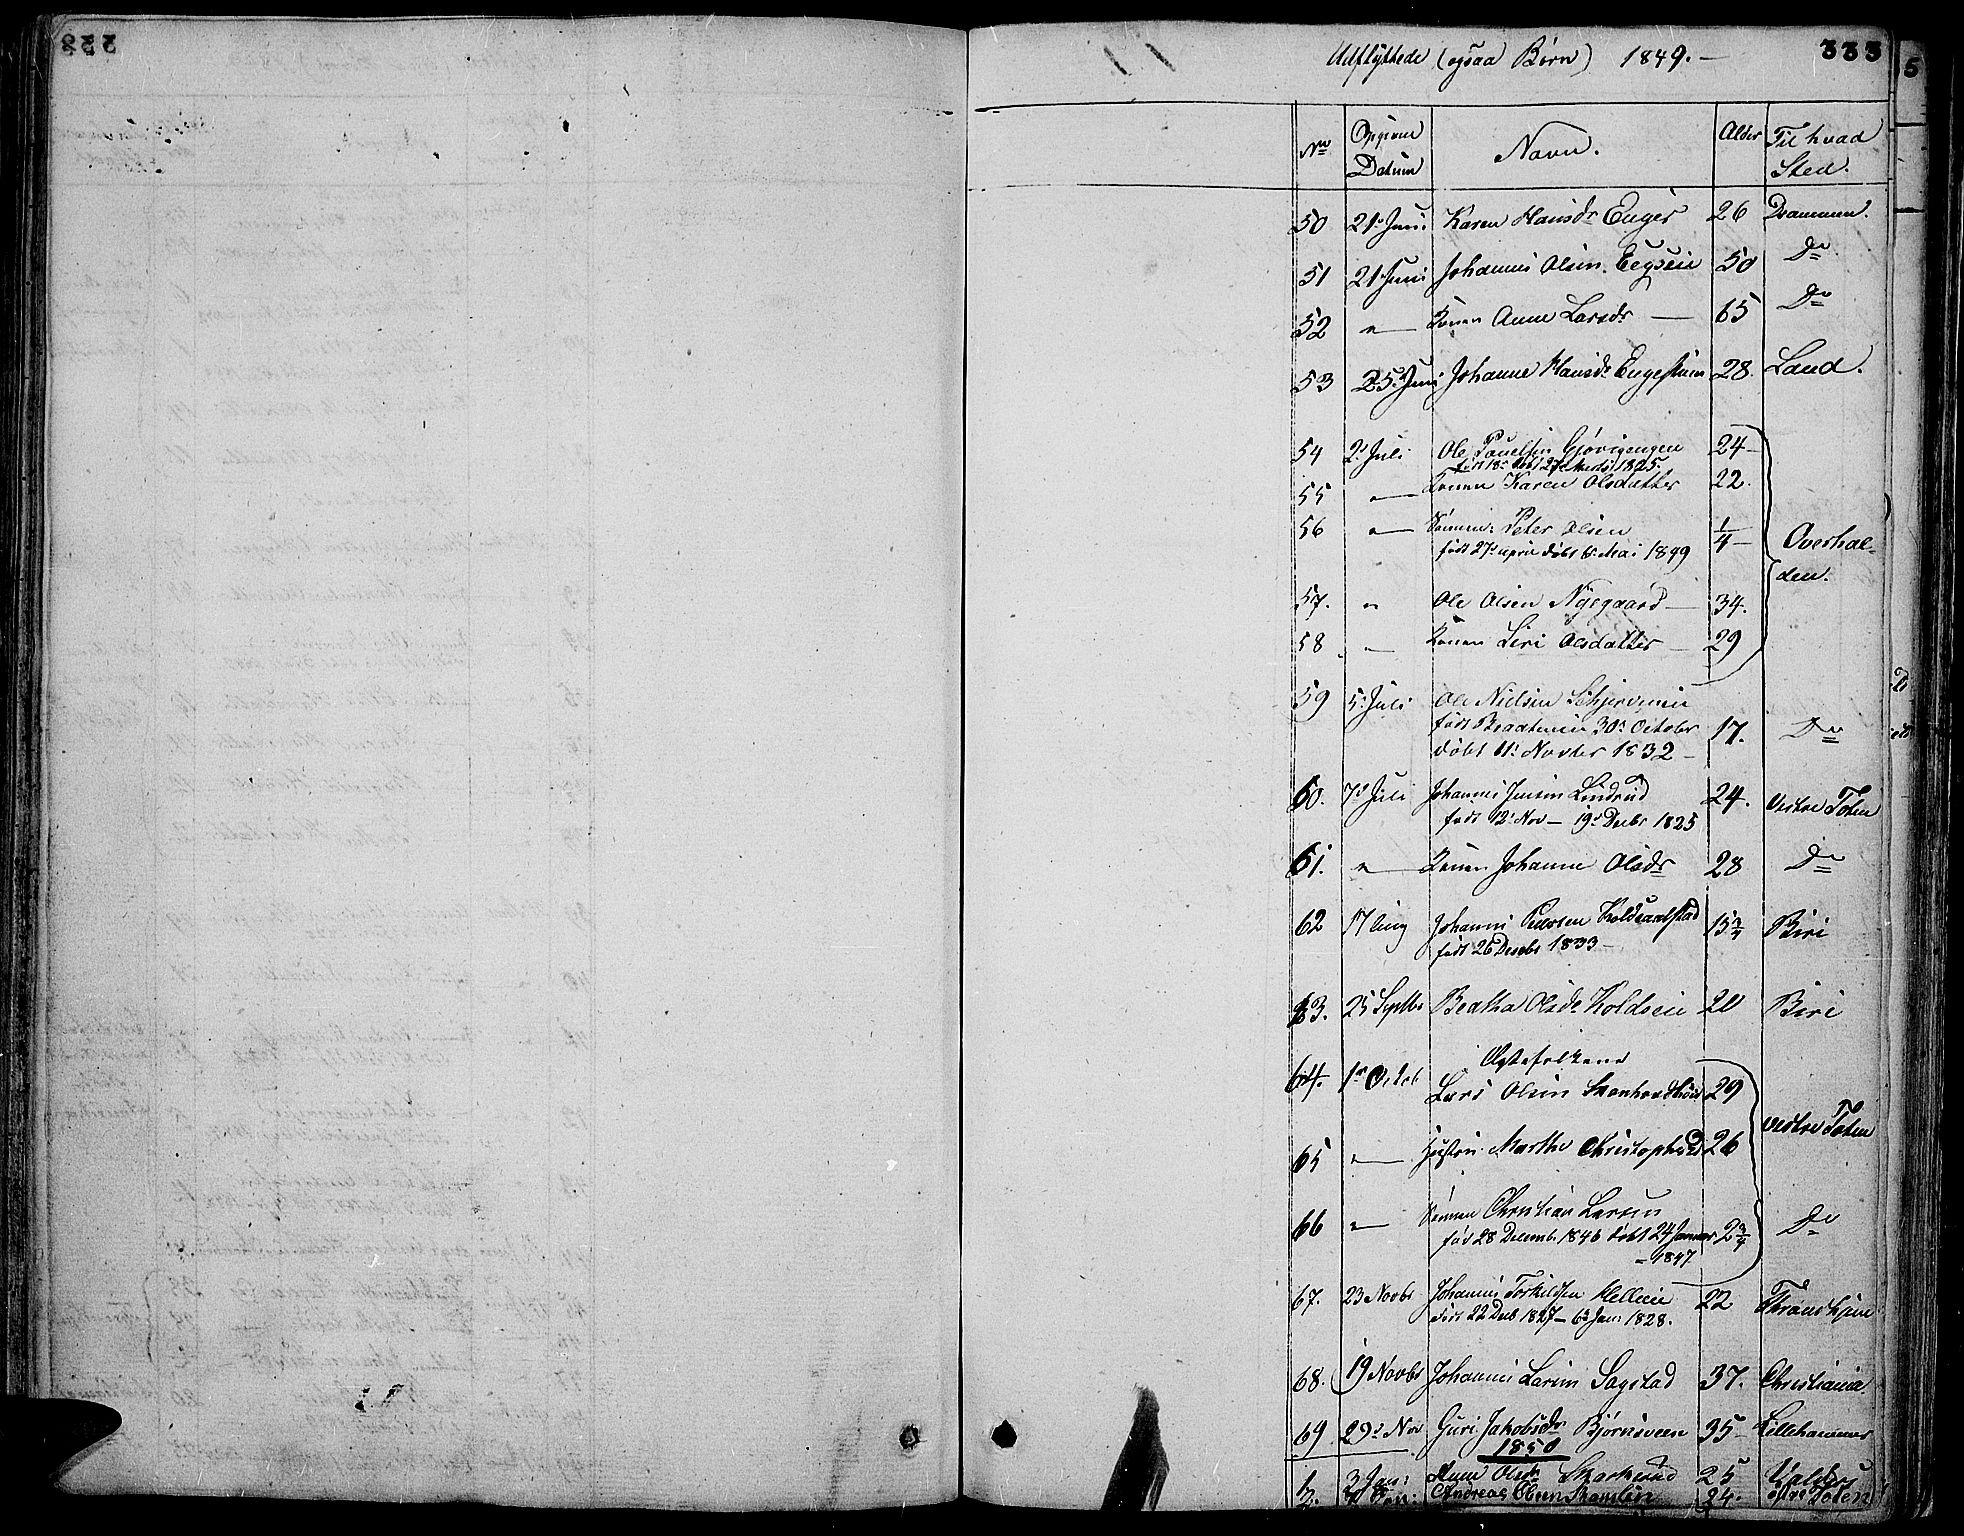 SAH, Vardal prestekontor, H/Ha/Hab/L0004: Klokkerbok nr. 4, 1831-1853, s. 333